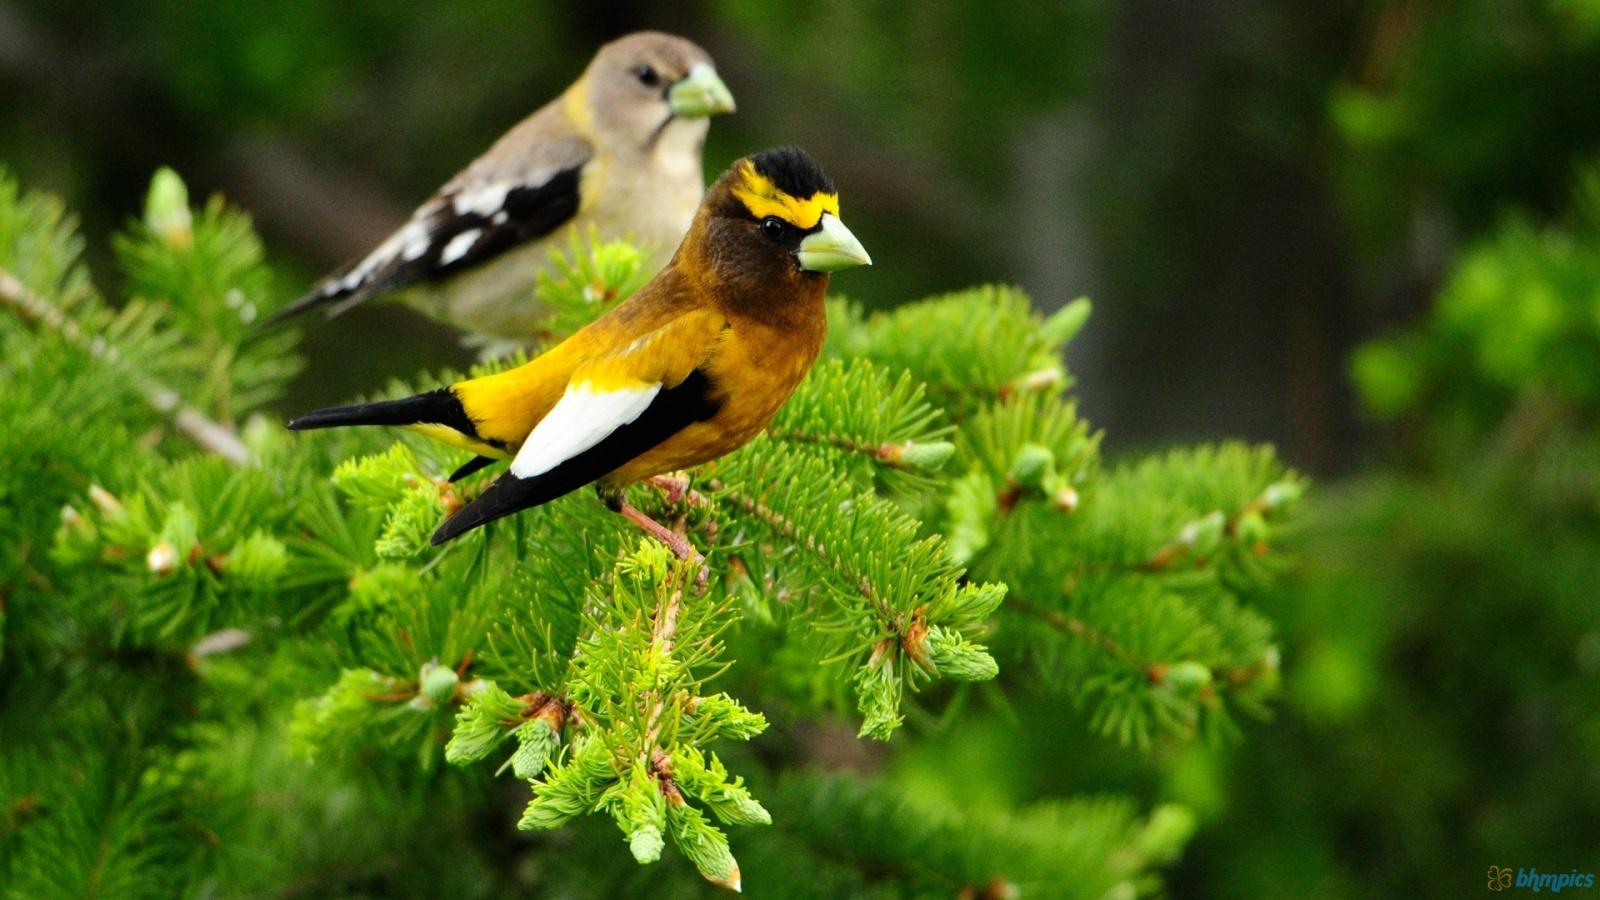 Bird On A Fence 1600x900 410 HD Wallpaper Res 1600x900 DesktopAS 1600x900